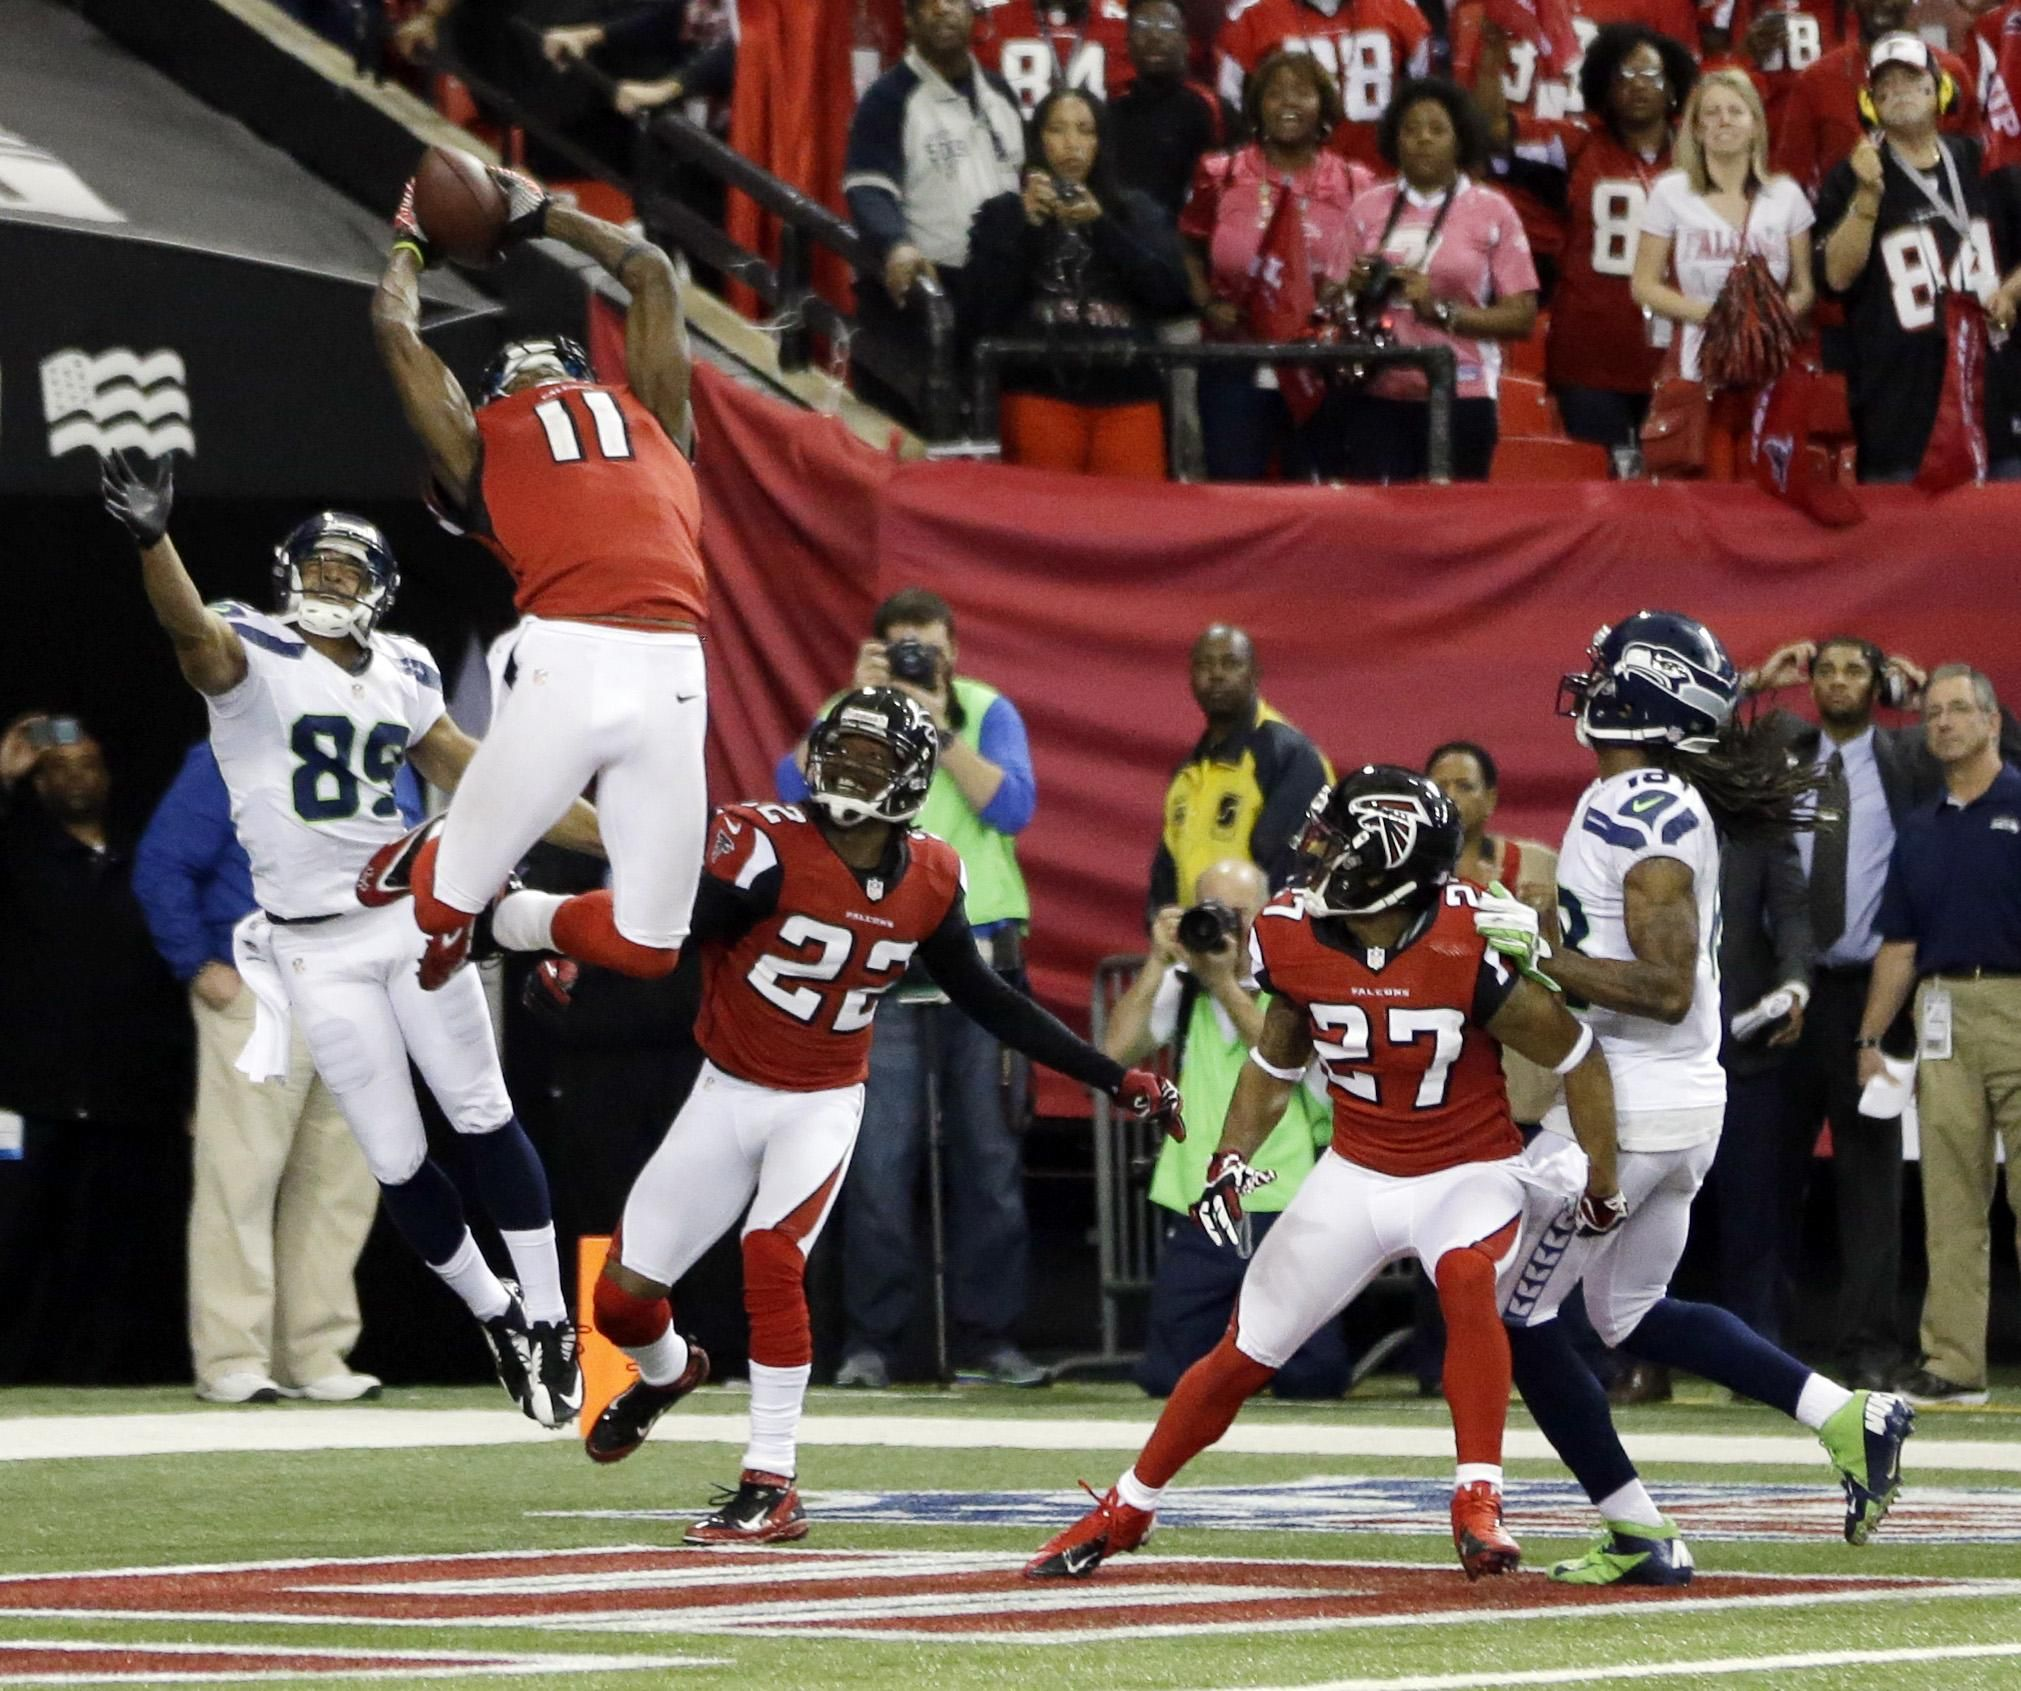 Former University Of Alabama Julio Jones Sealing The Deal For The Atlanta Falcons In The Win Against The S Julio Jones Atlanta Falcons Football Atlanta Falcons